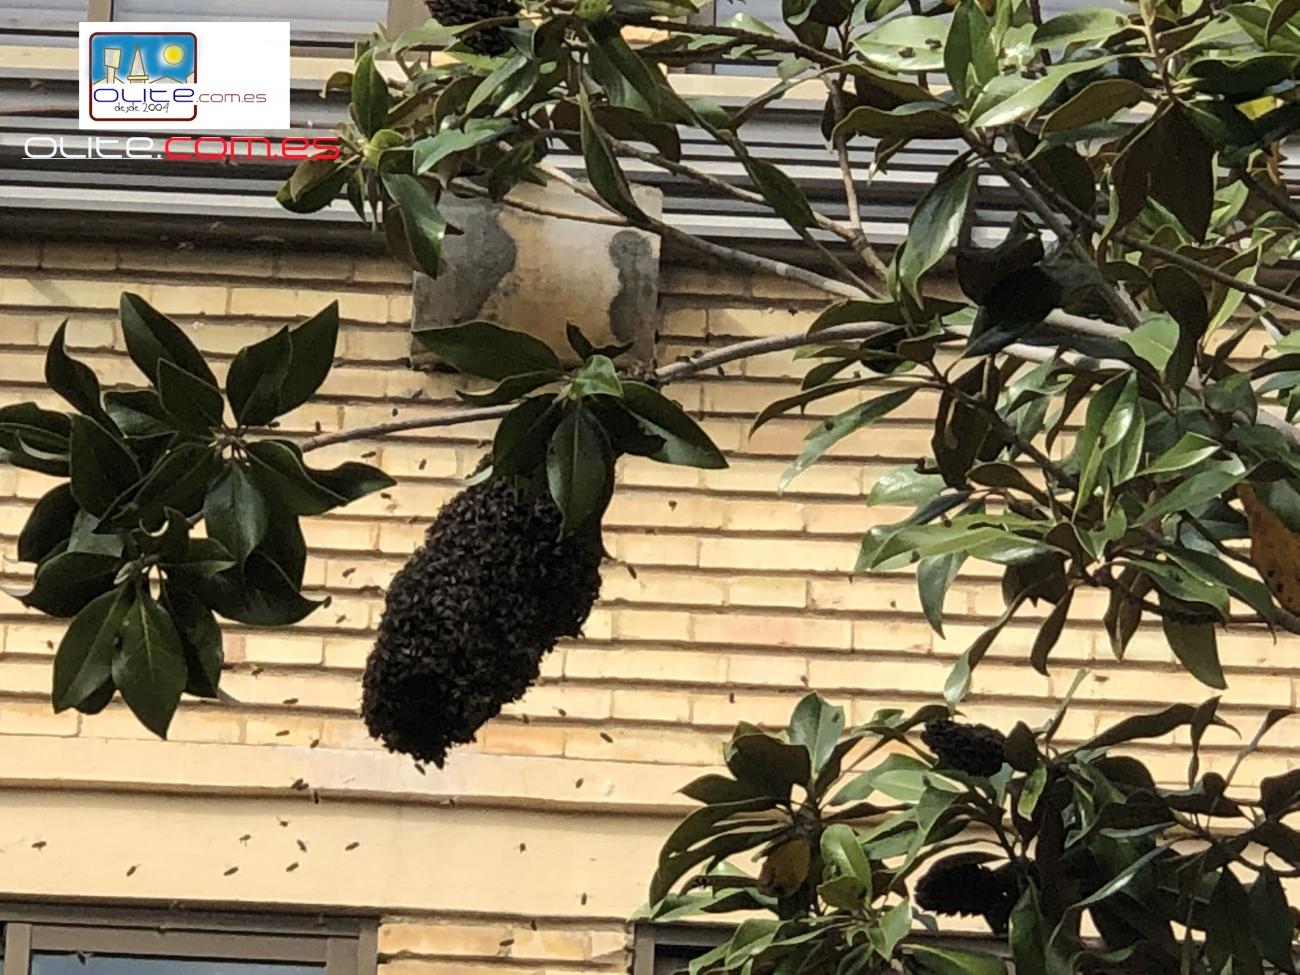 Olite.Un gran enjambre de abejas en la Plaza de la música.